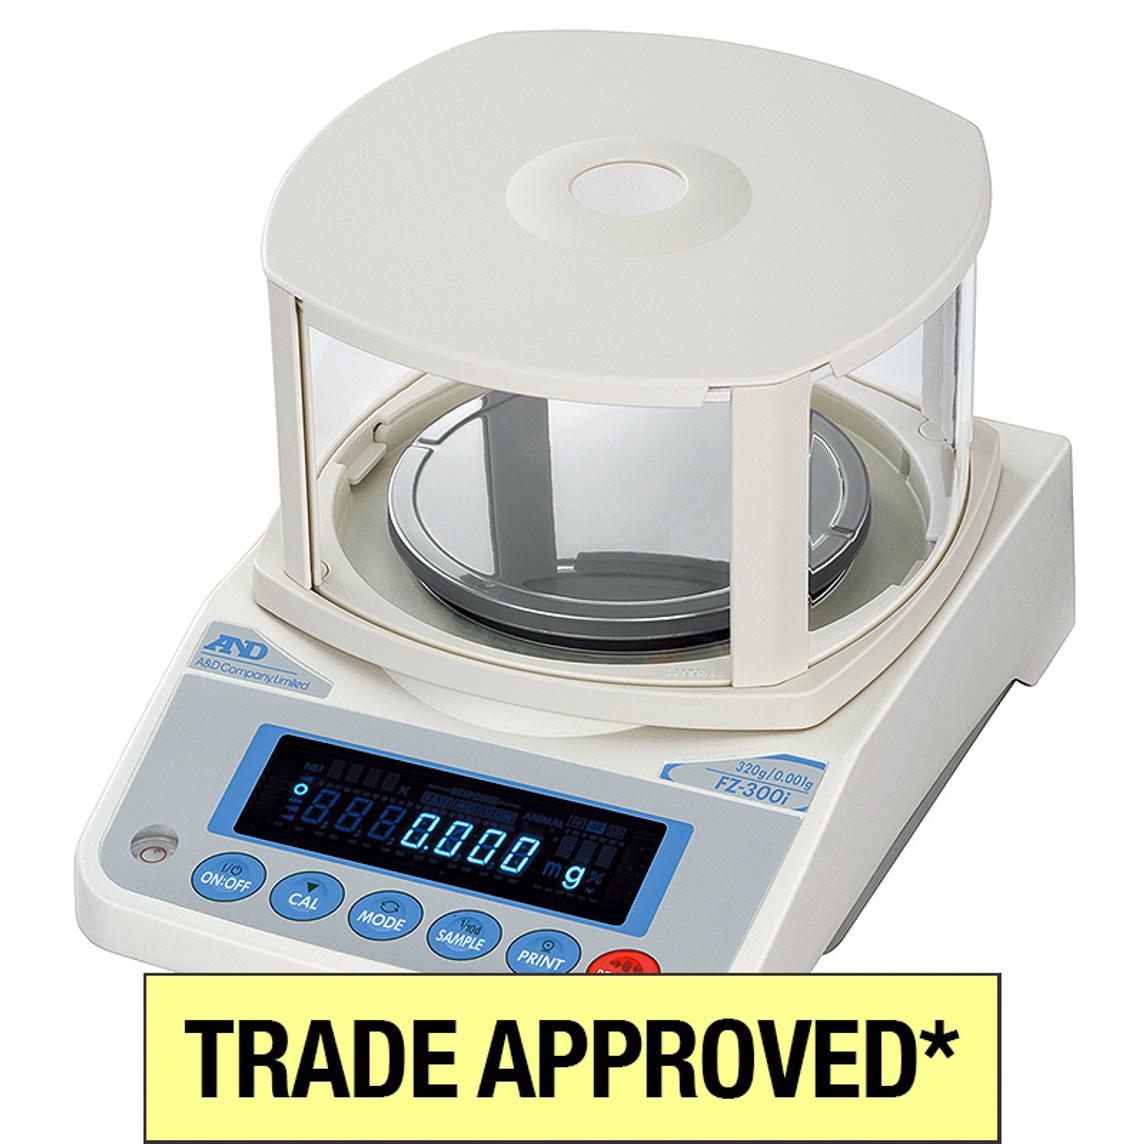 A&D FZ-i Trade Approved Balance